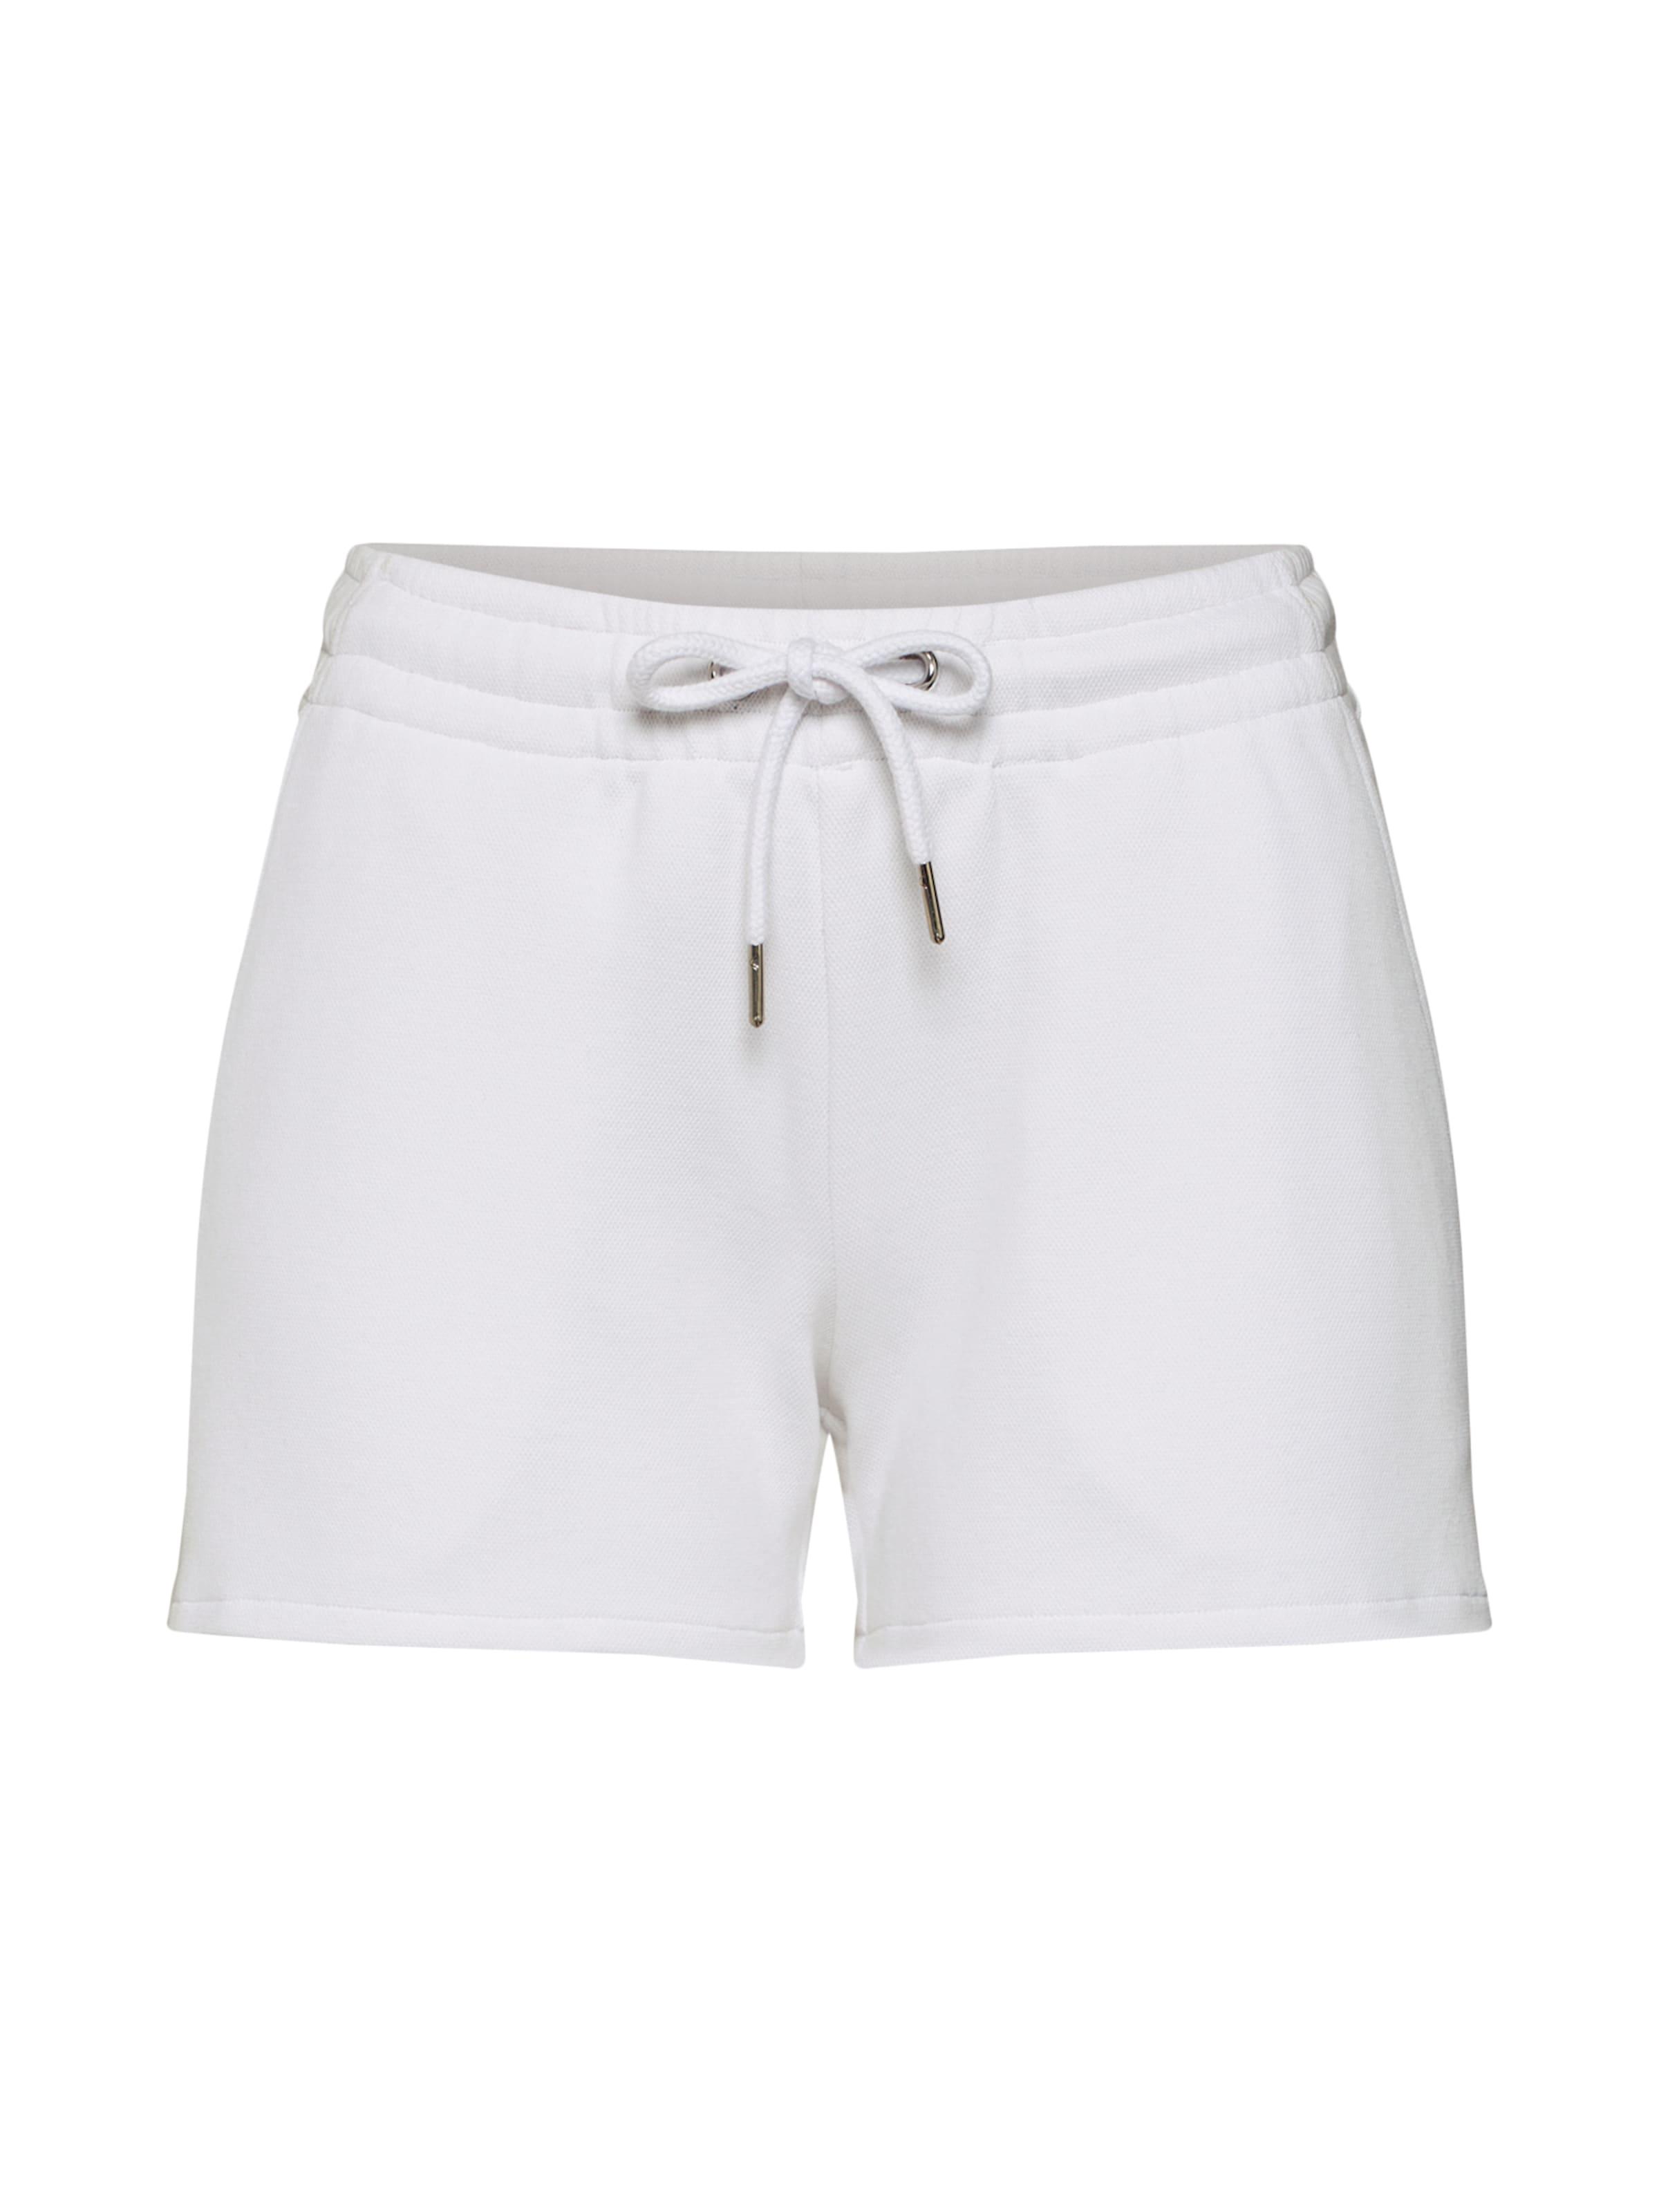 Urban En Pantalon Pique' Classics 'heavy Blanc Fl1KJc